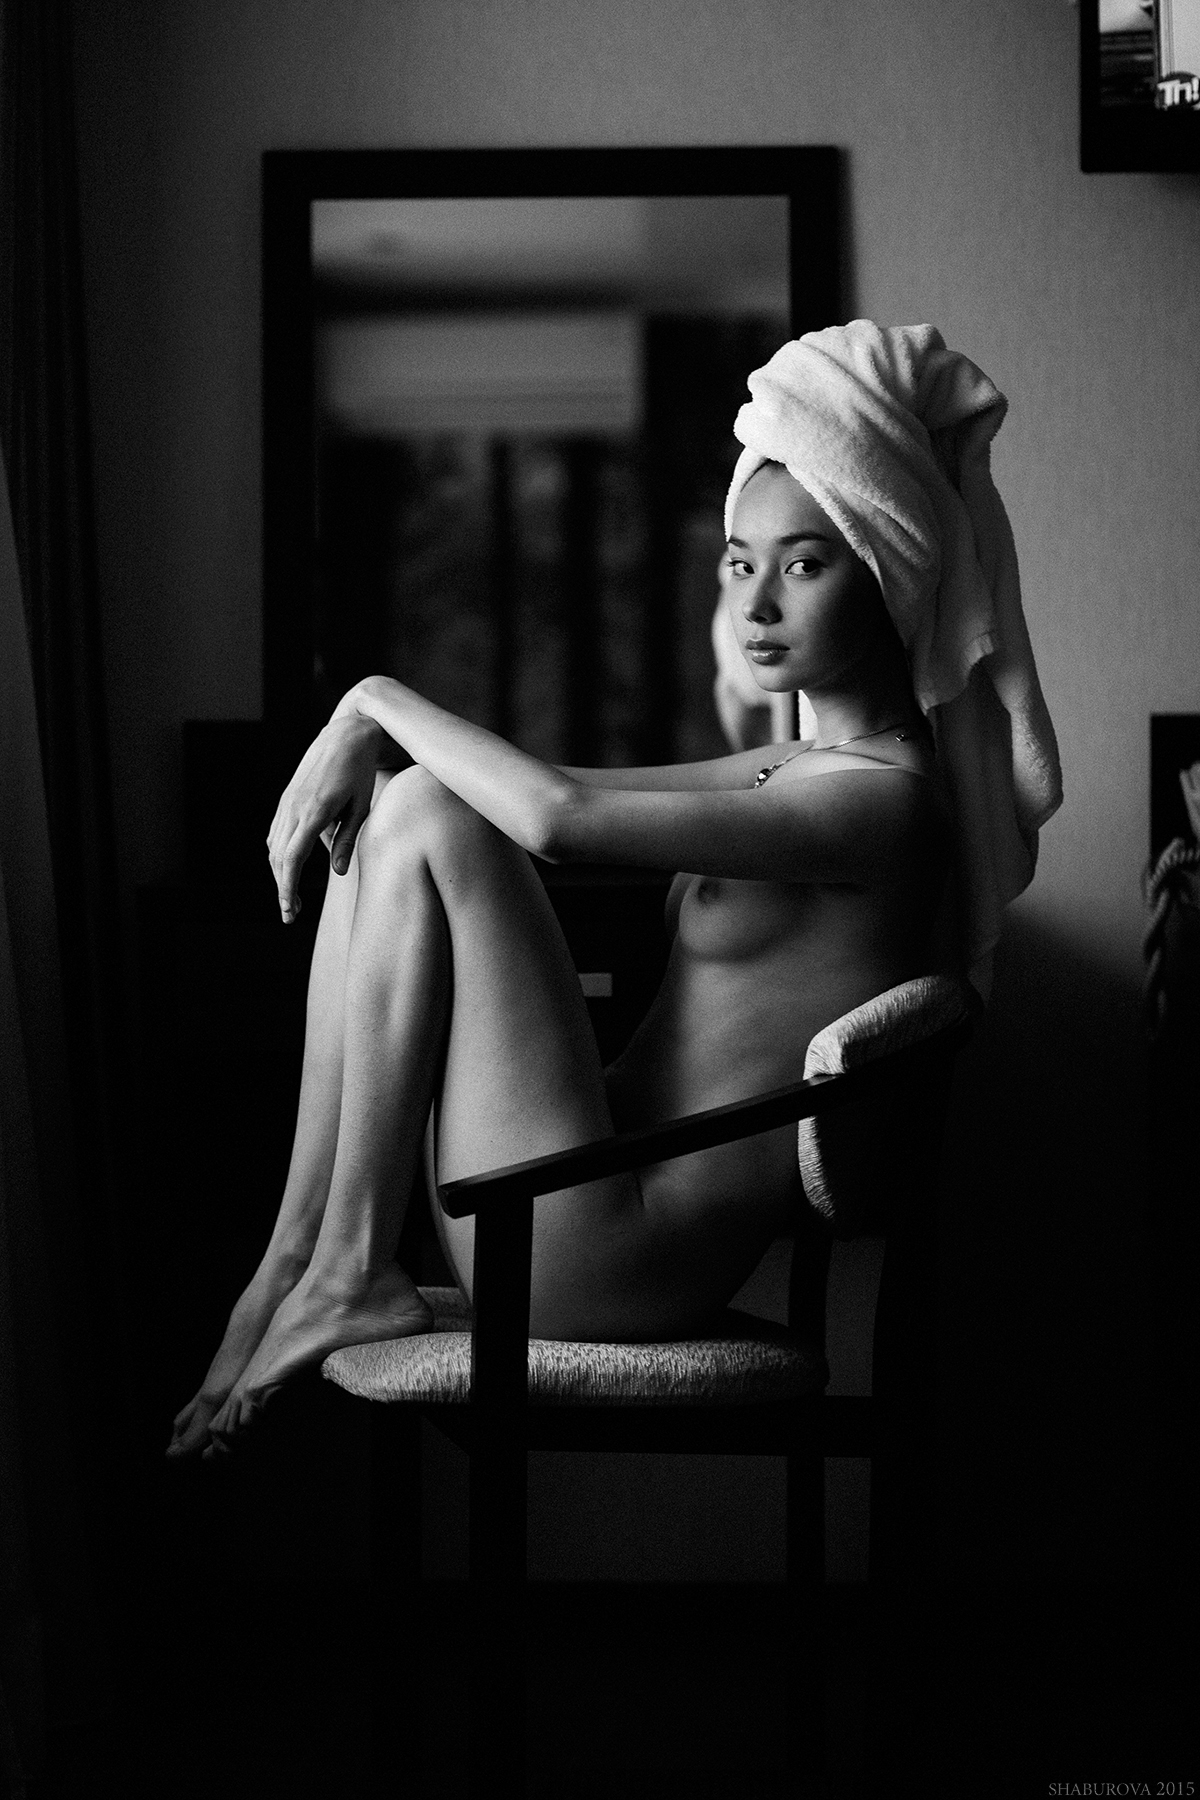 Чистая / фотограф Шабурова Лиза